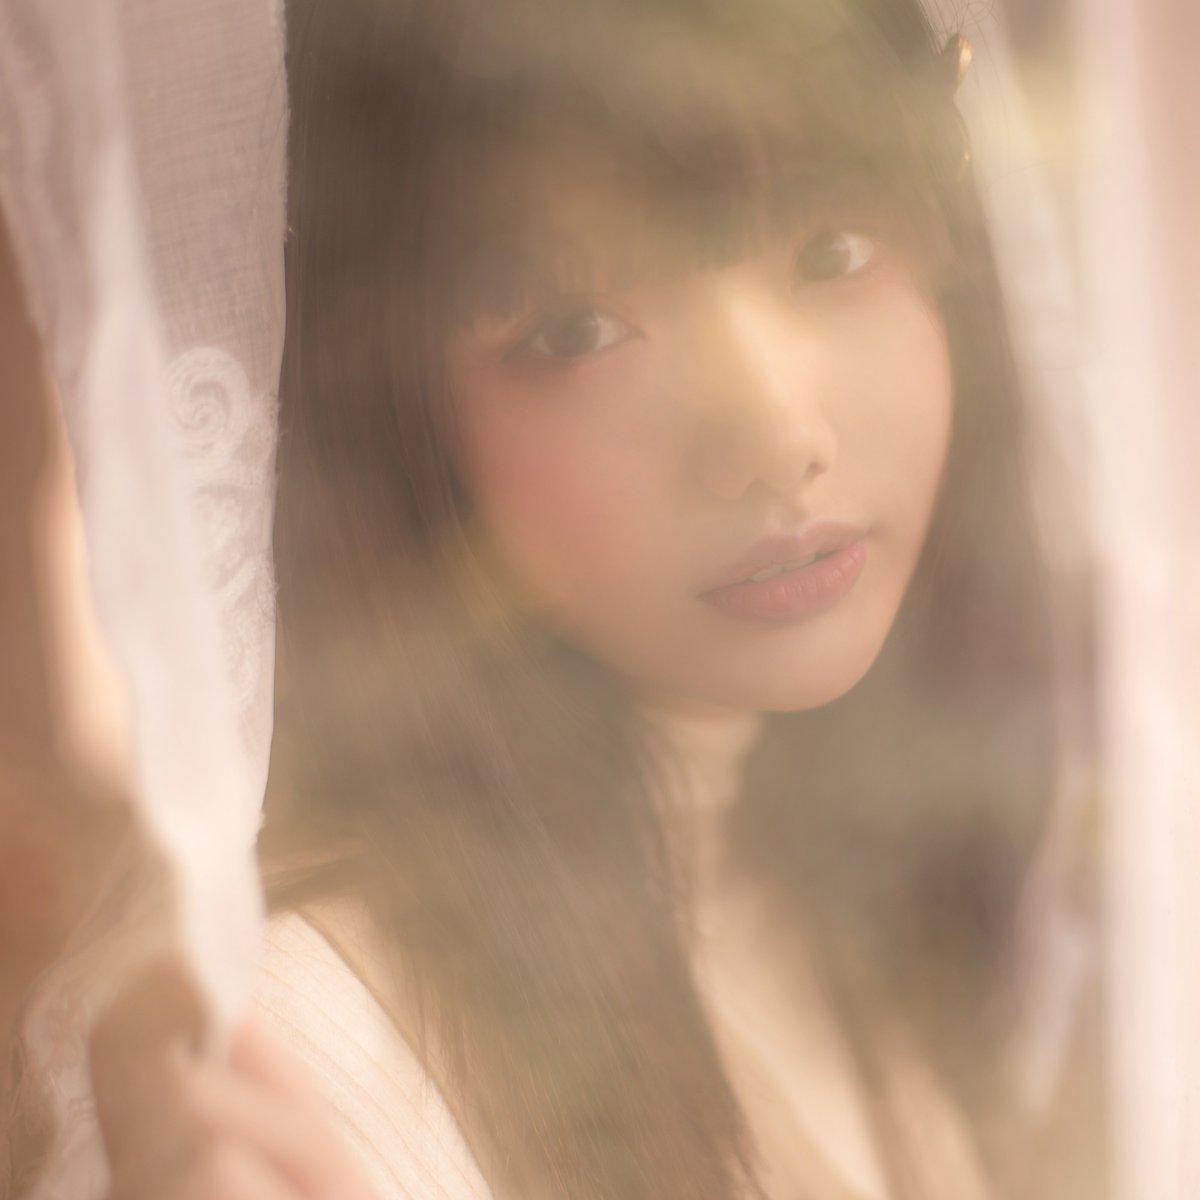 #写真  #photo #girl #art #art_gallery #photography  #photographer  #portrait  #chengdu  #成都